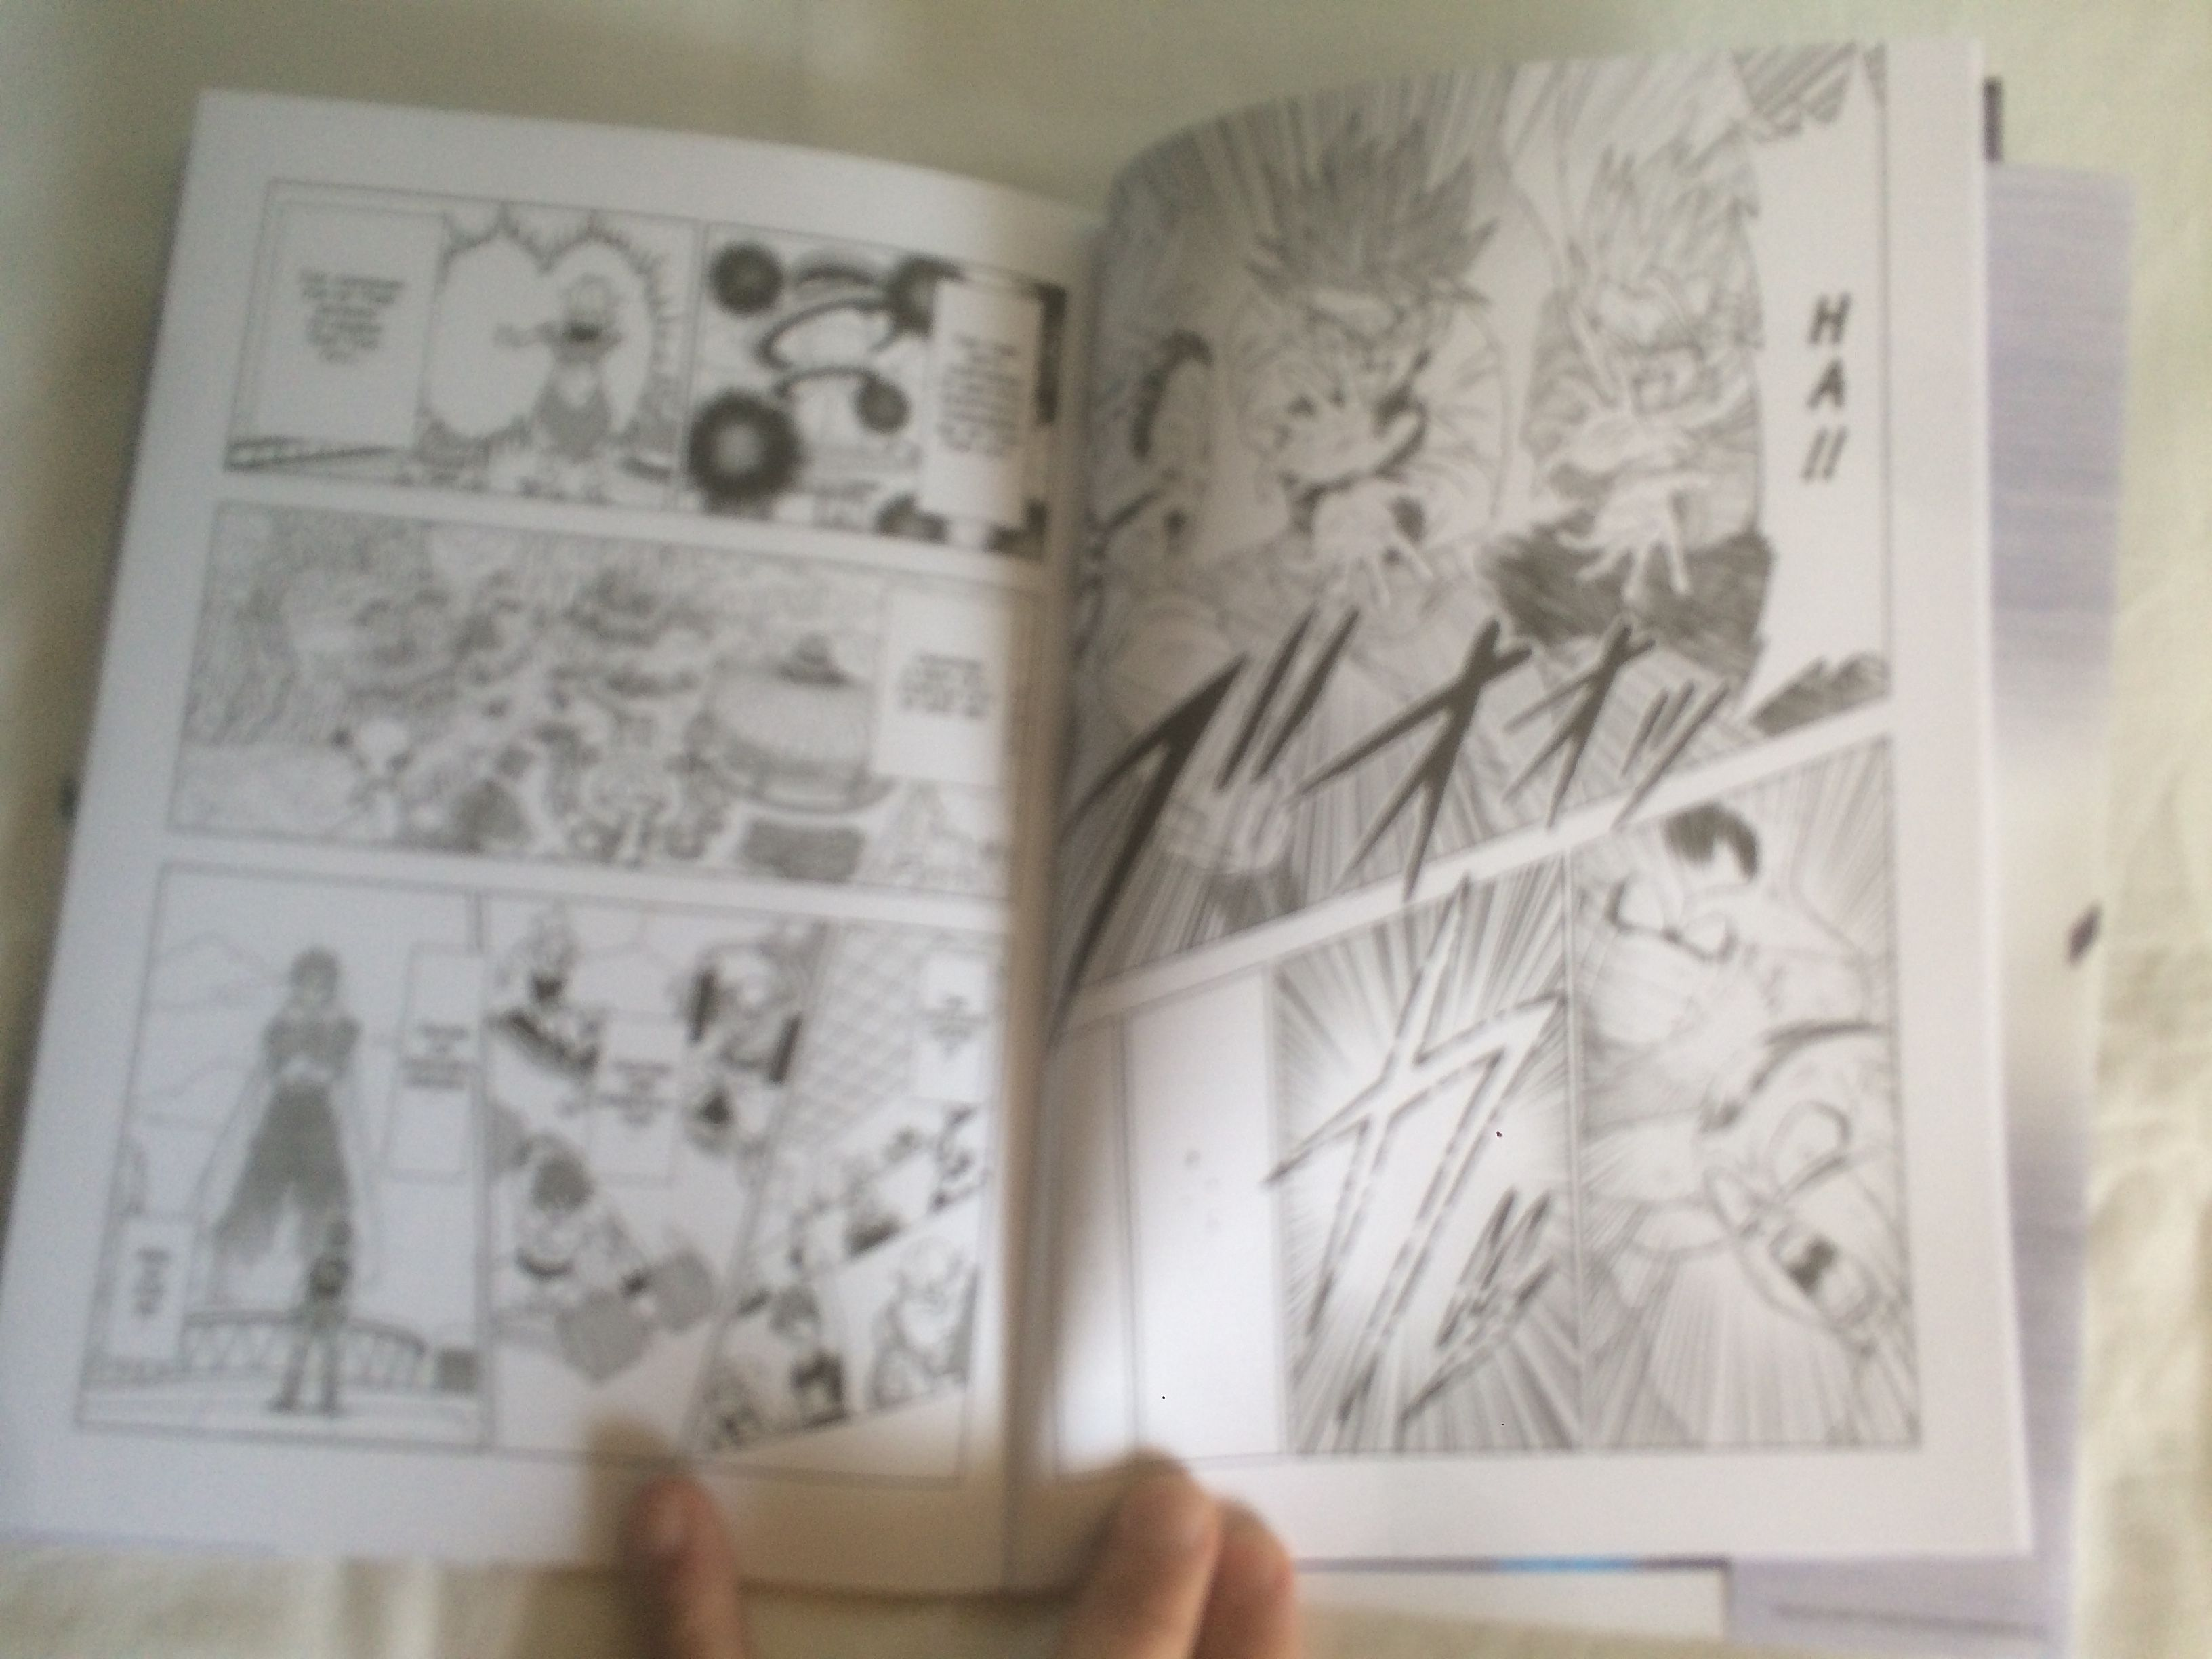 Dragon Ball Xenoverse 2 The manga page. Dragones, Dragon